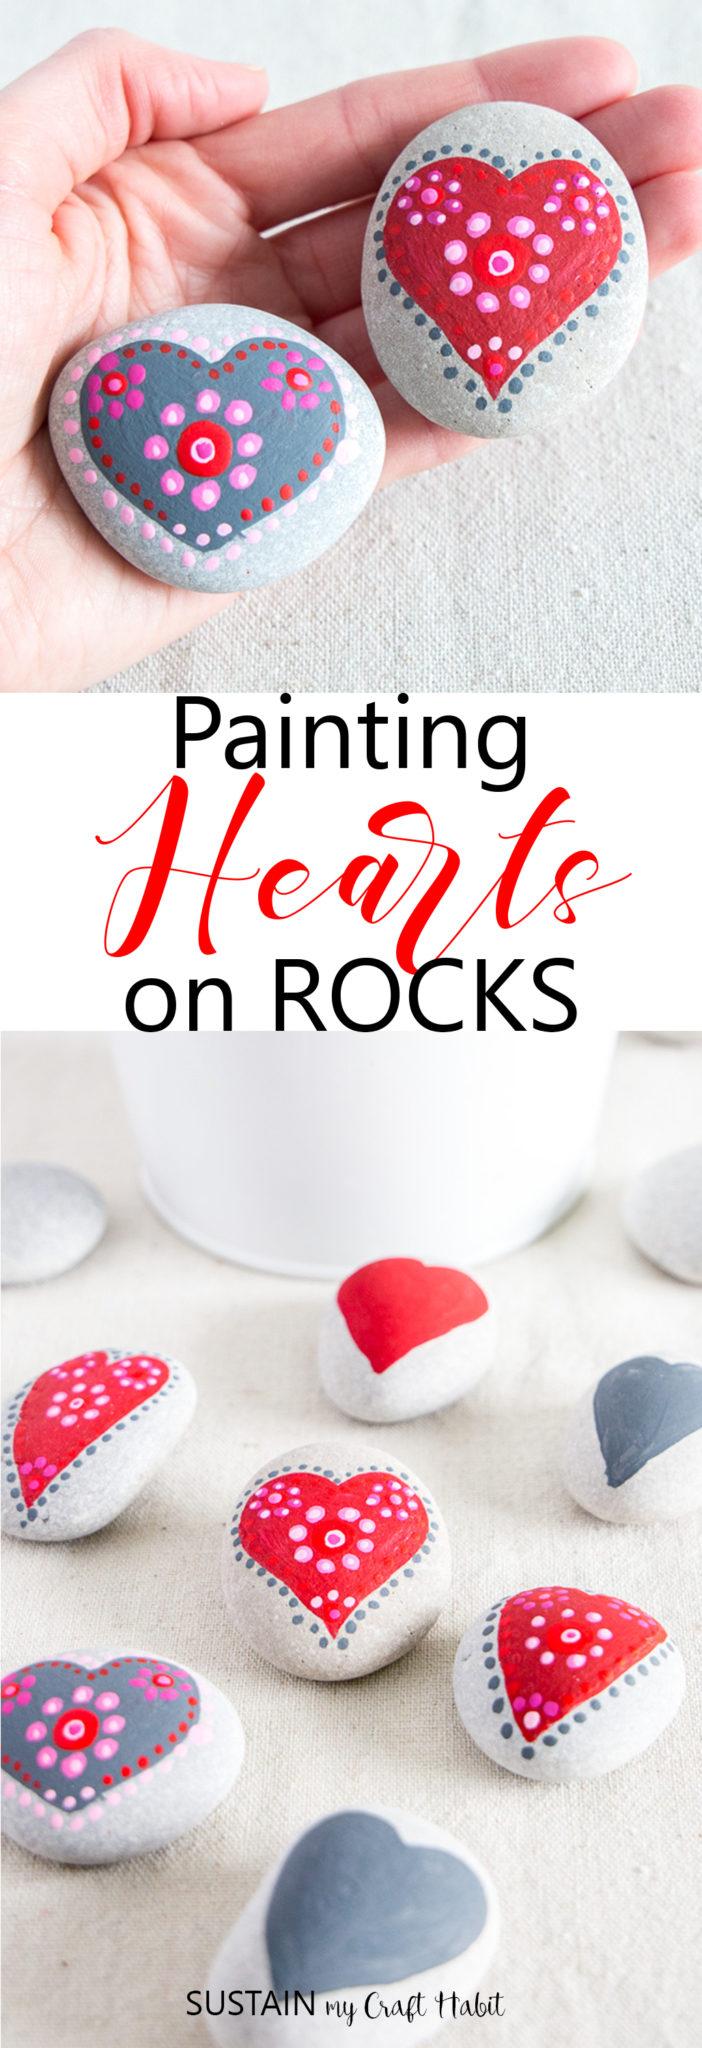 heart painting rocks